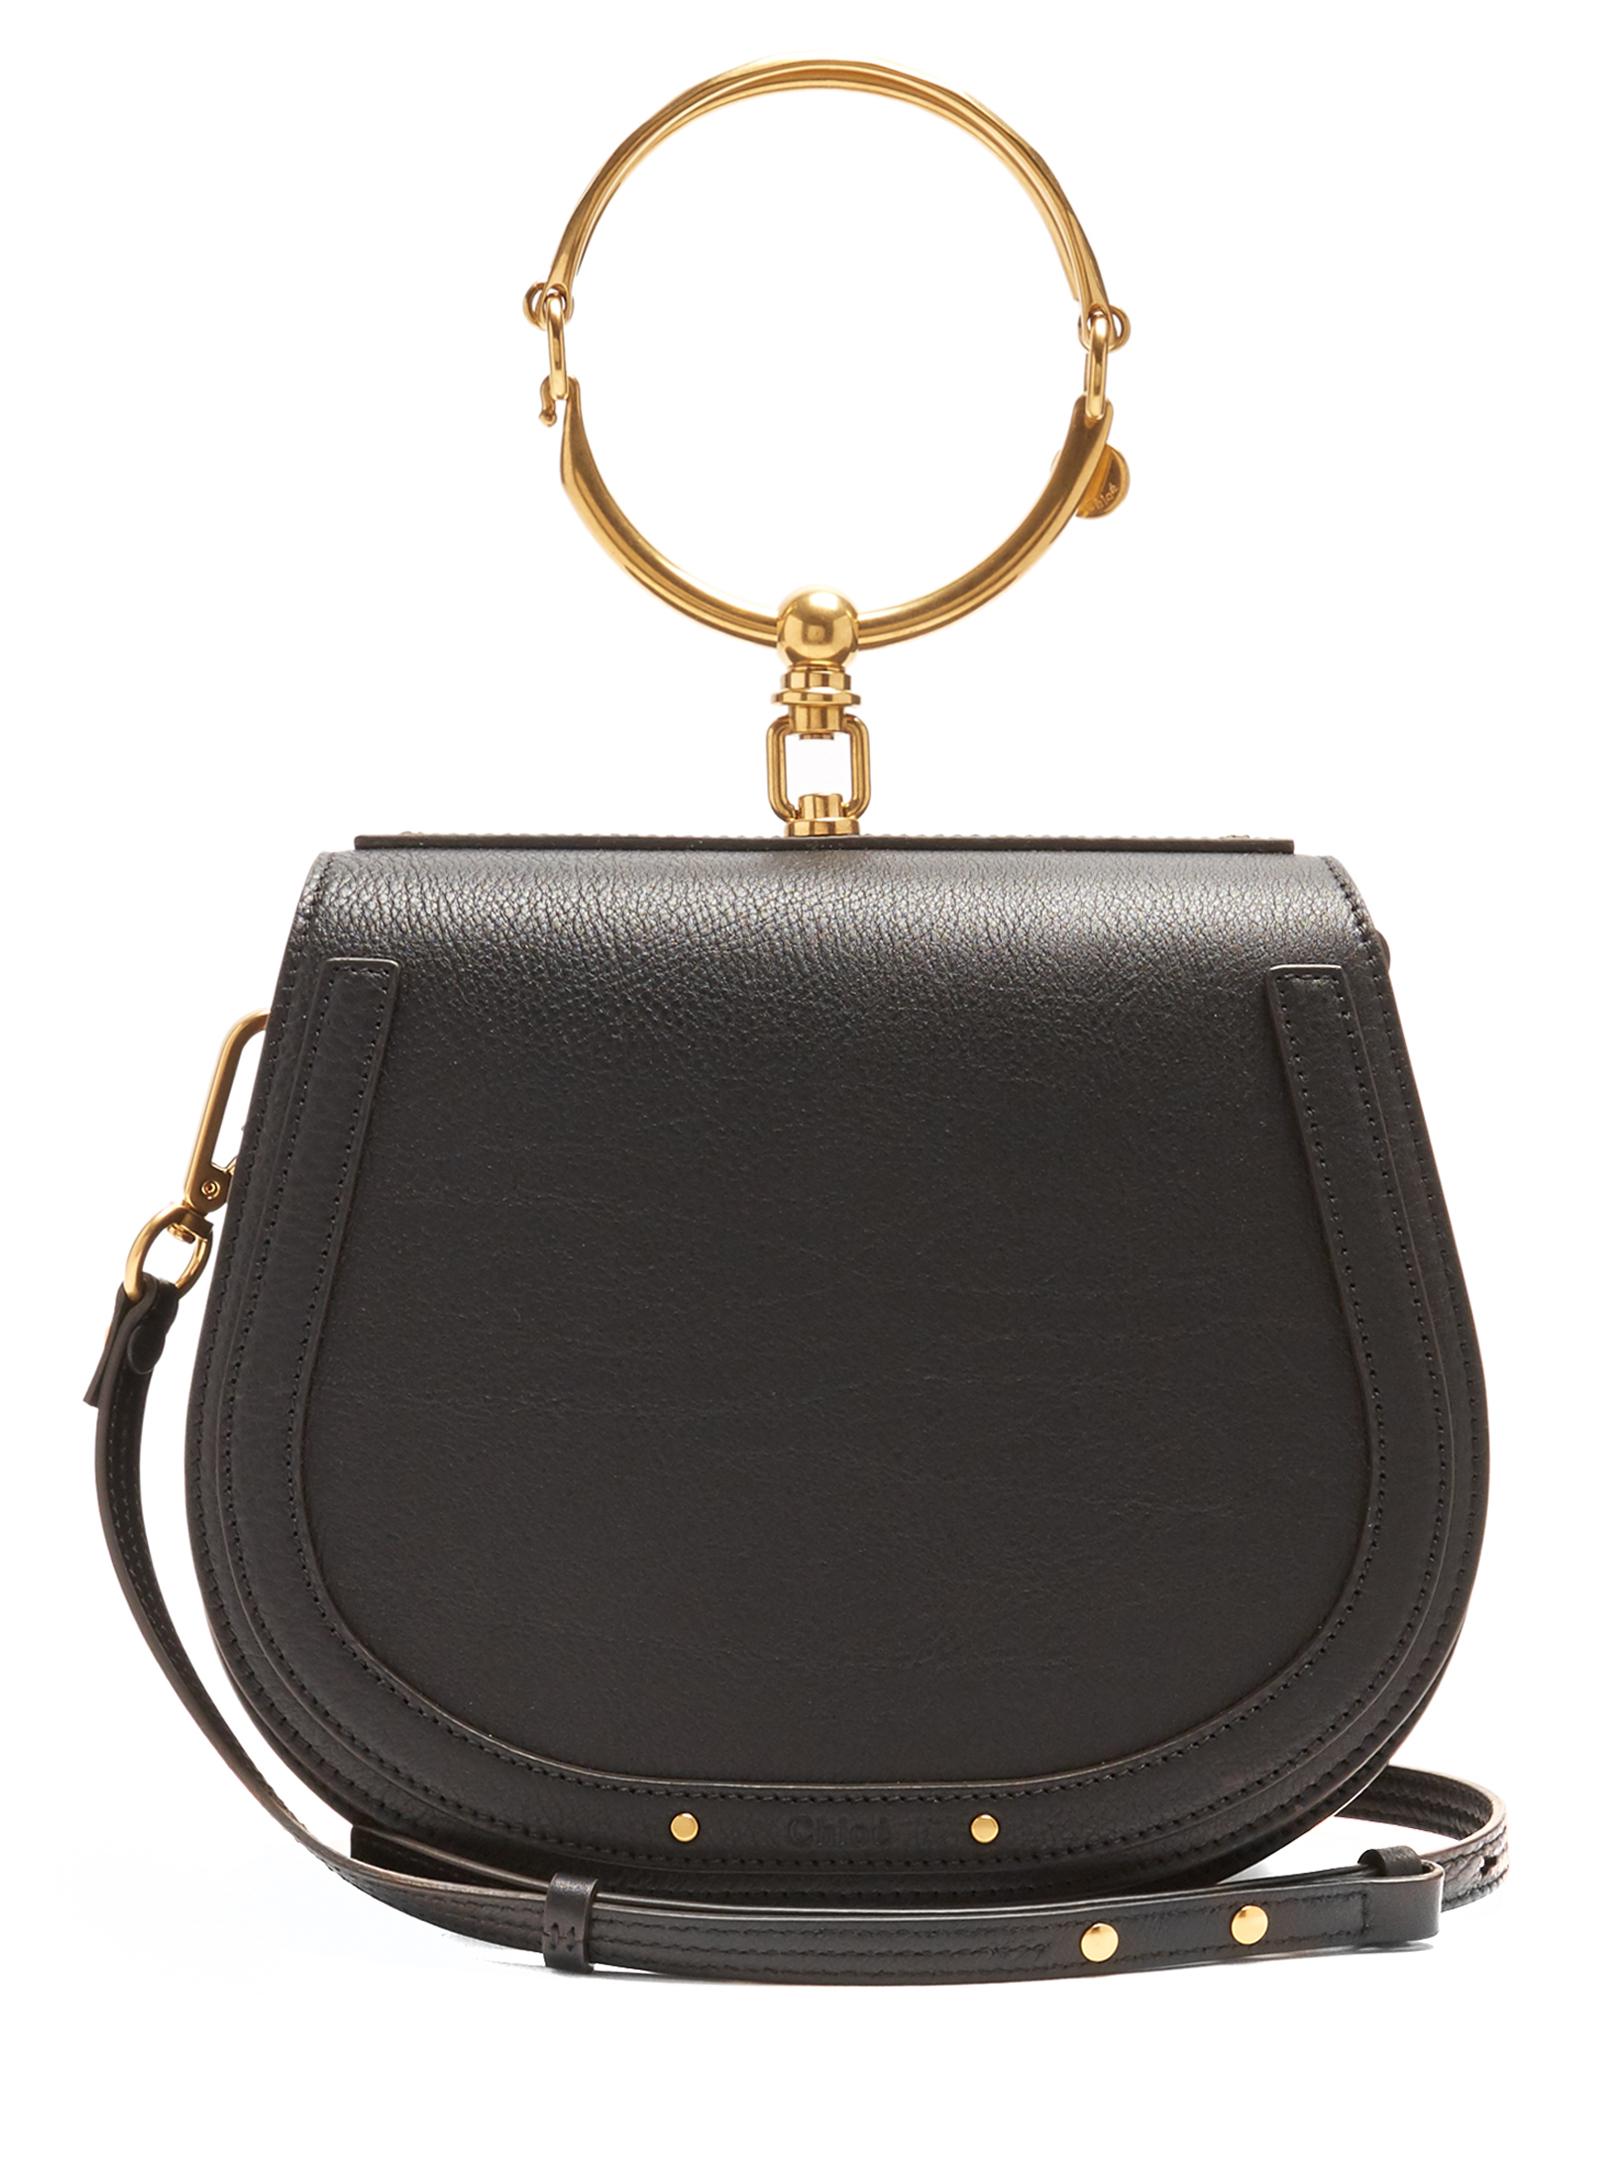 Chloe Nile medium leather cross-body bag